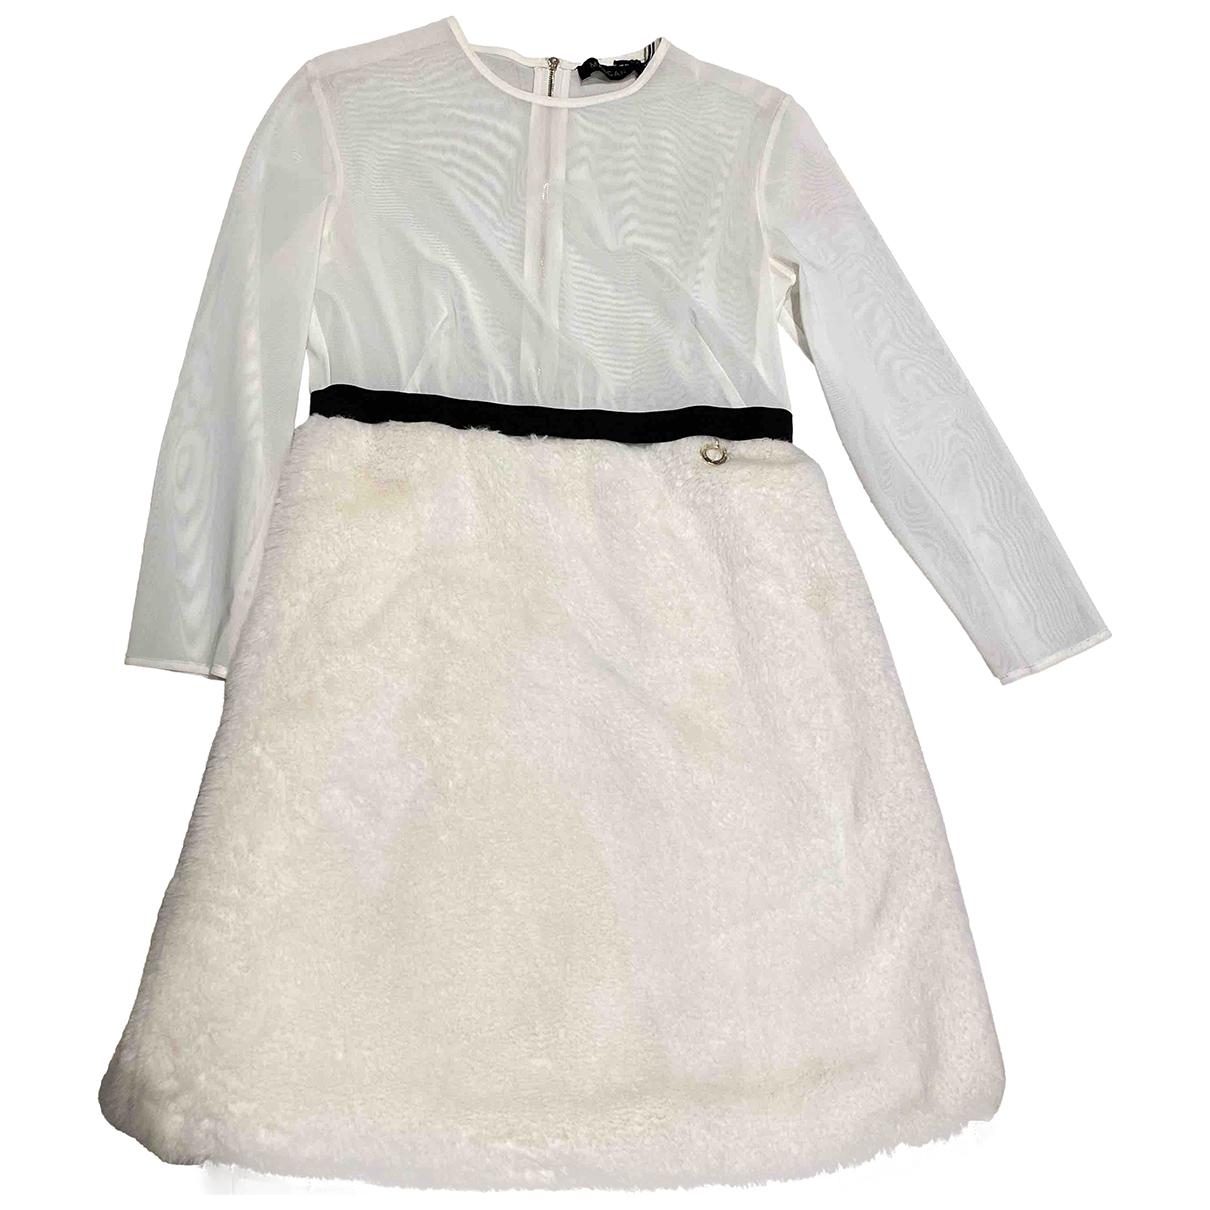 Mangano \N White dress for Women 42 IT